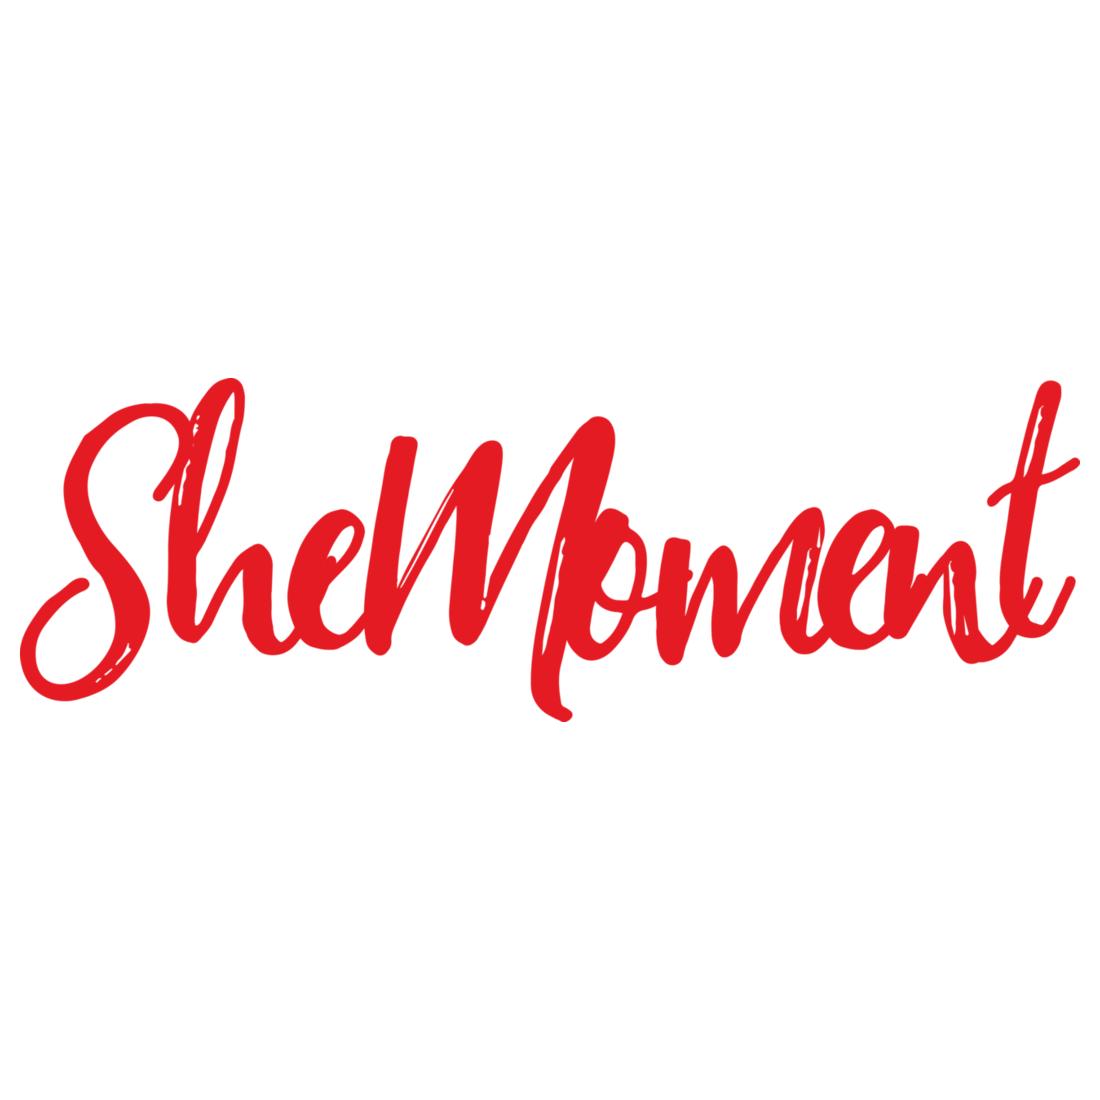 SheMoment